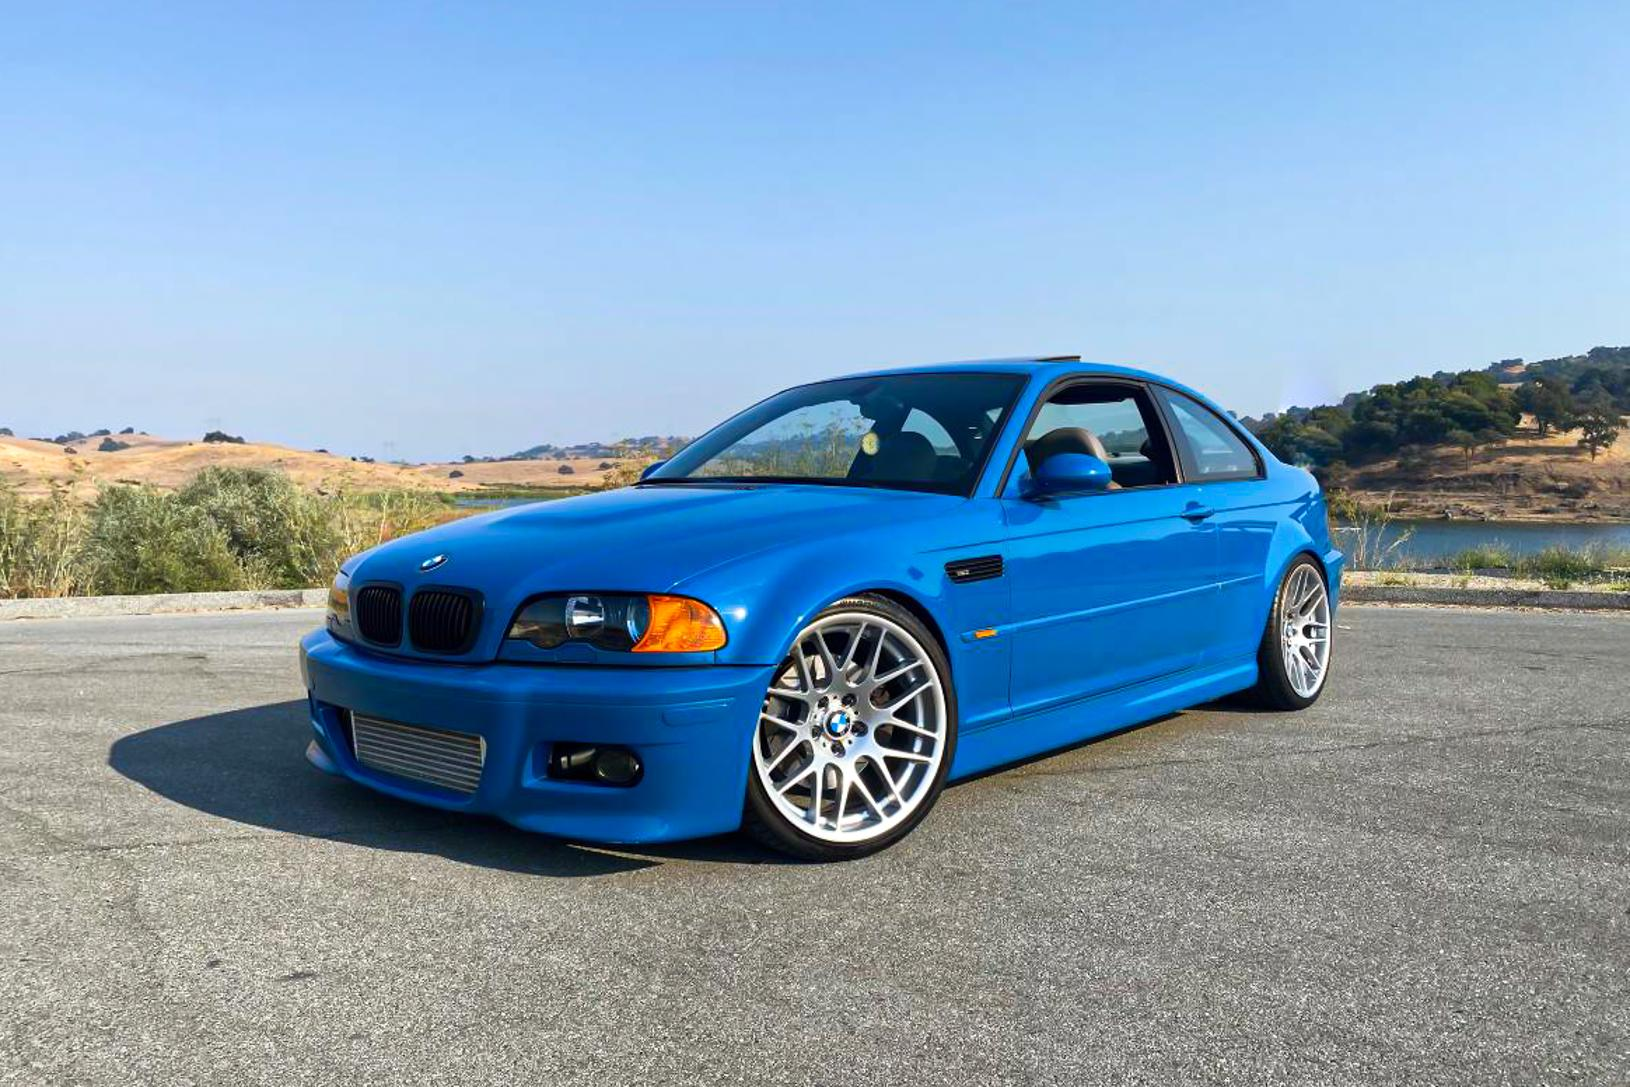 2001 BMW M3 'Turbo'